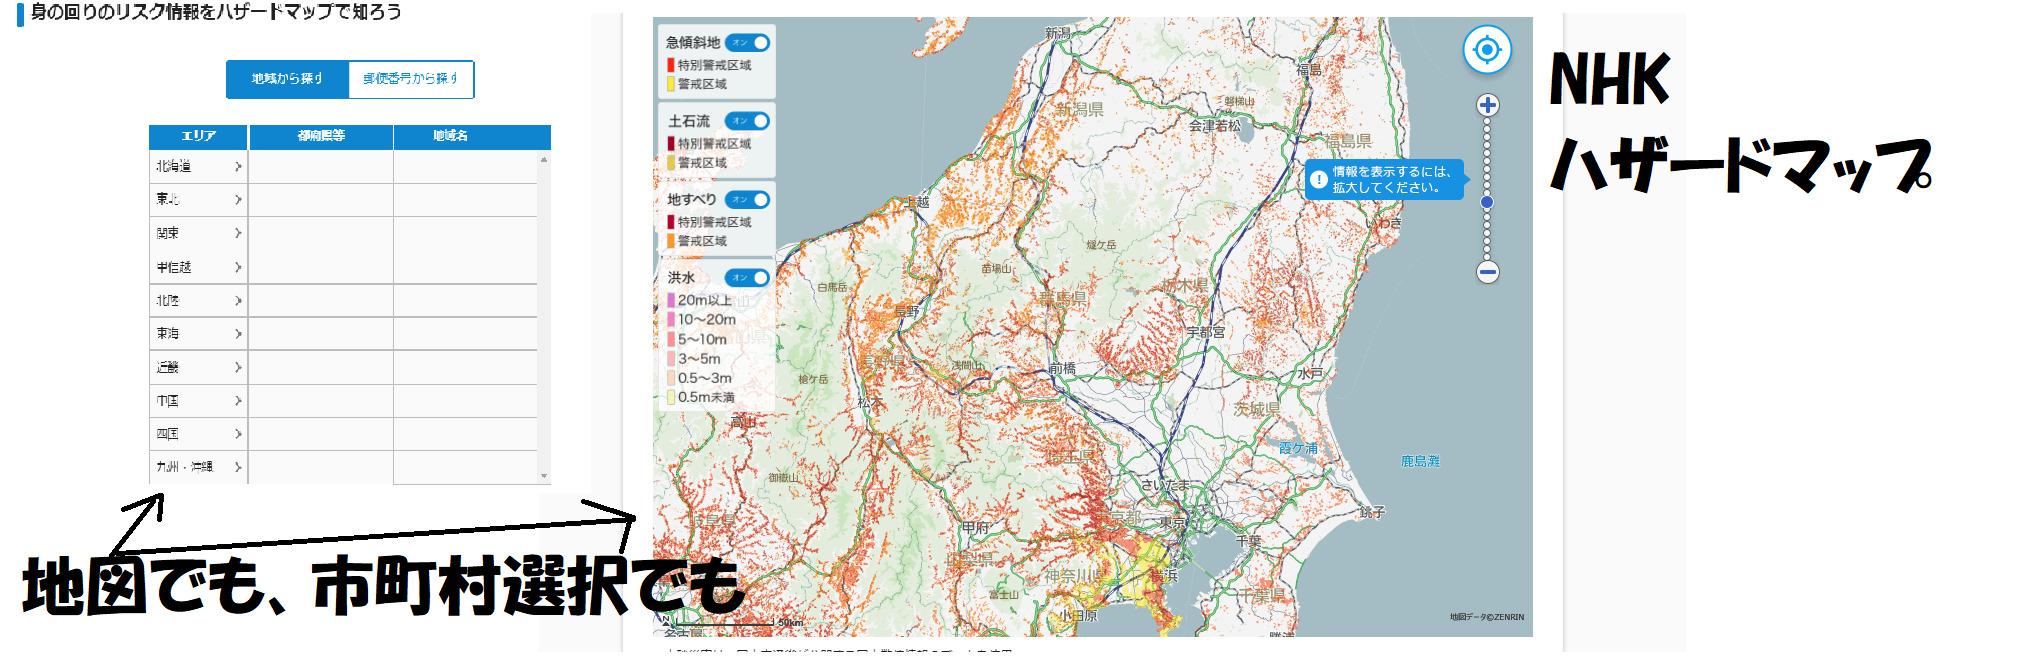 NHKハザードマップ